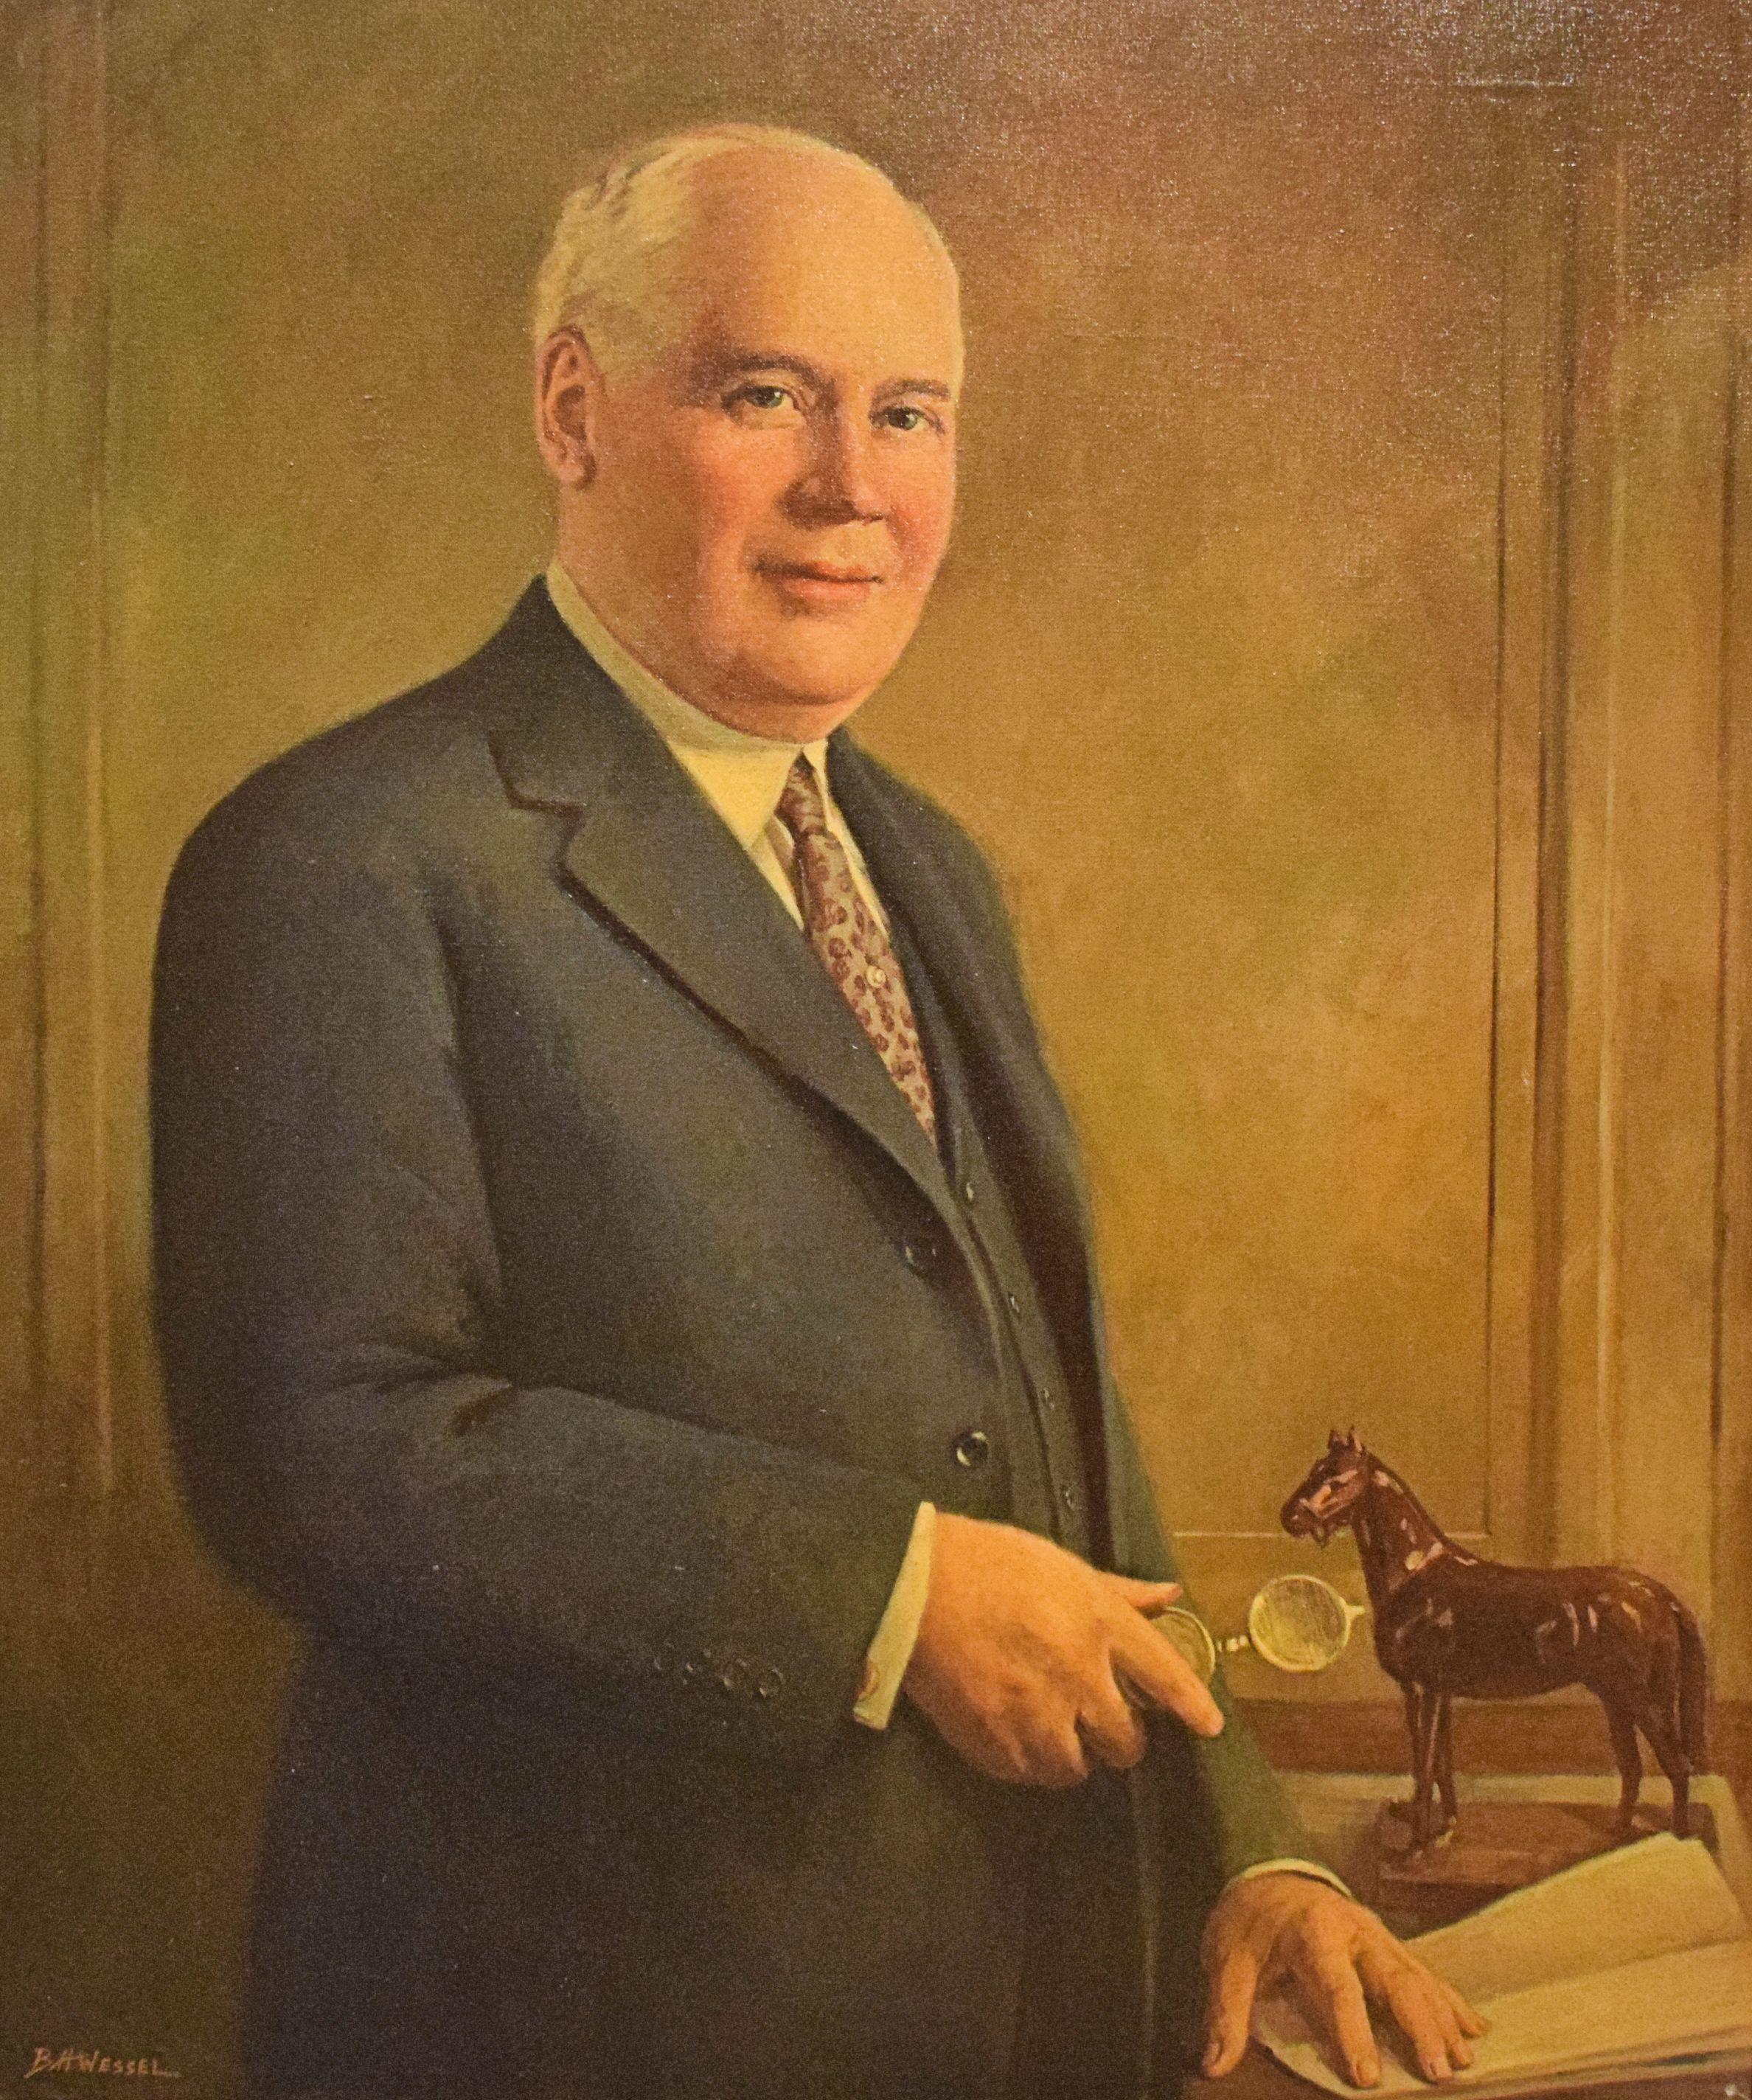 Portrait of Matt Winn by B. H. Wessel, 1935 (Museum Collection)